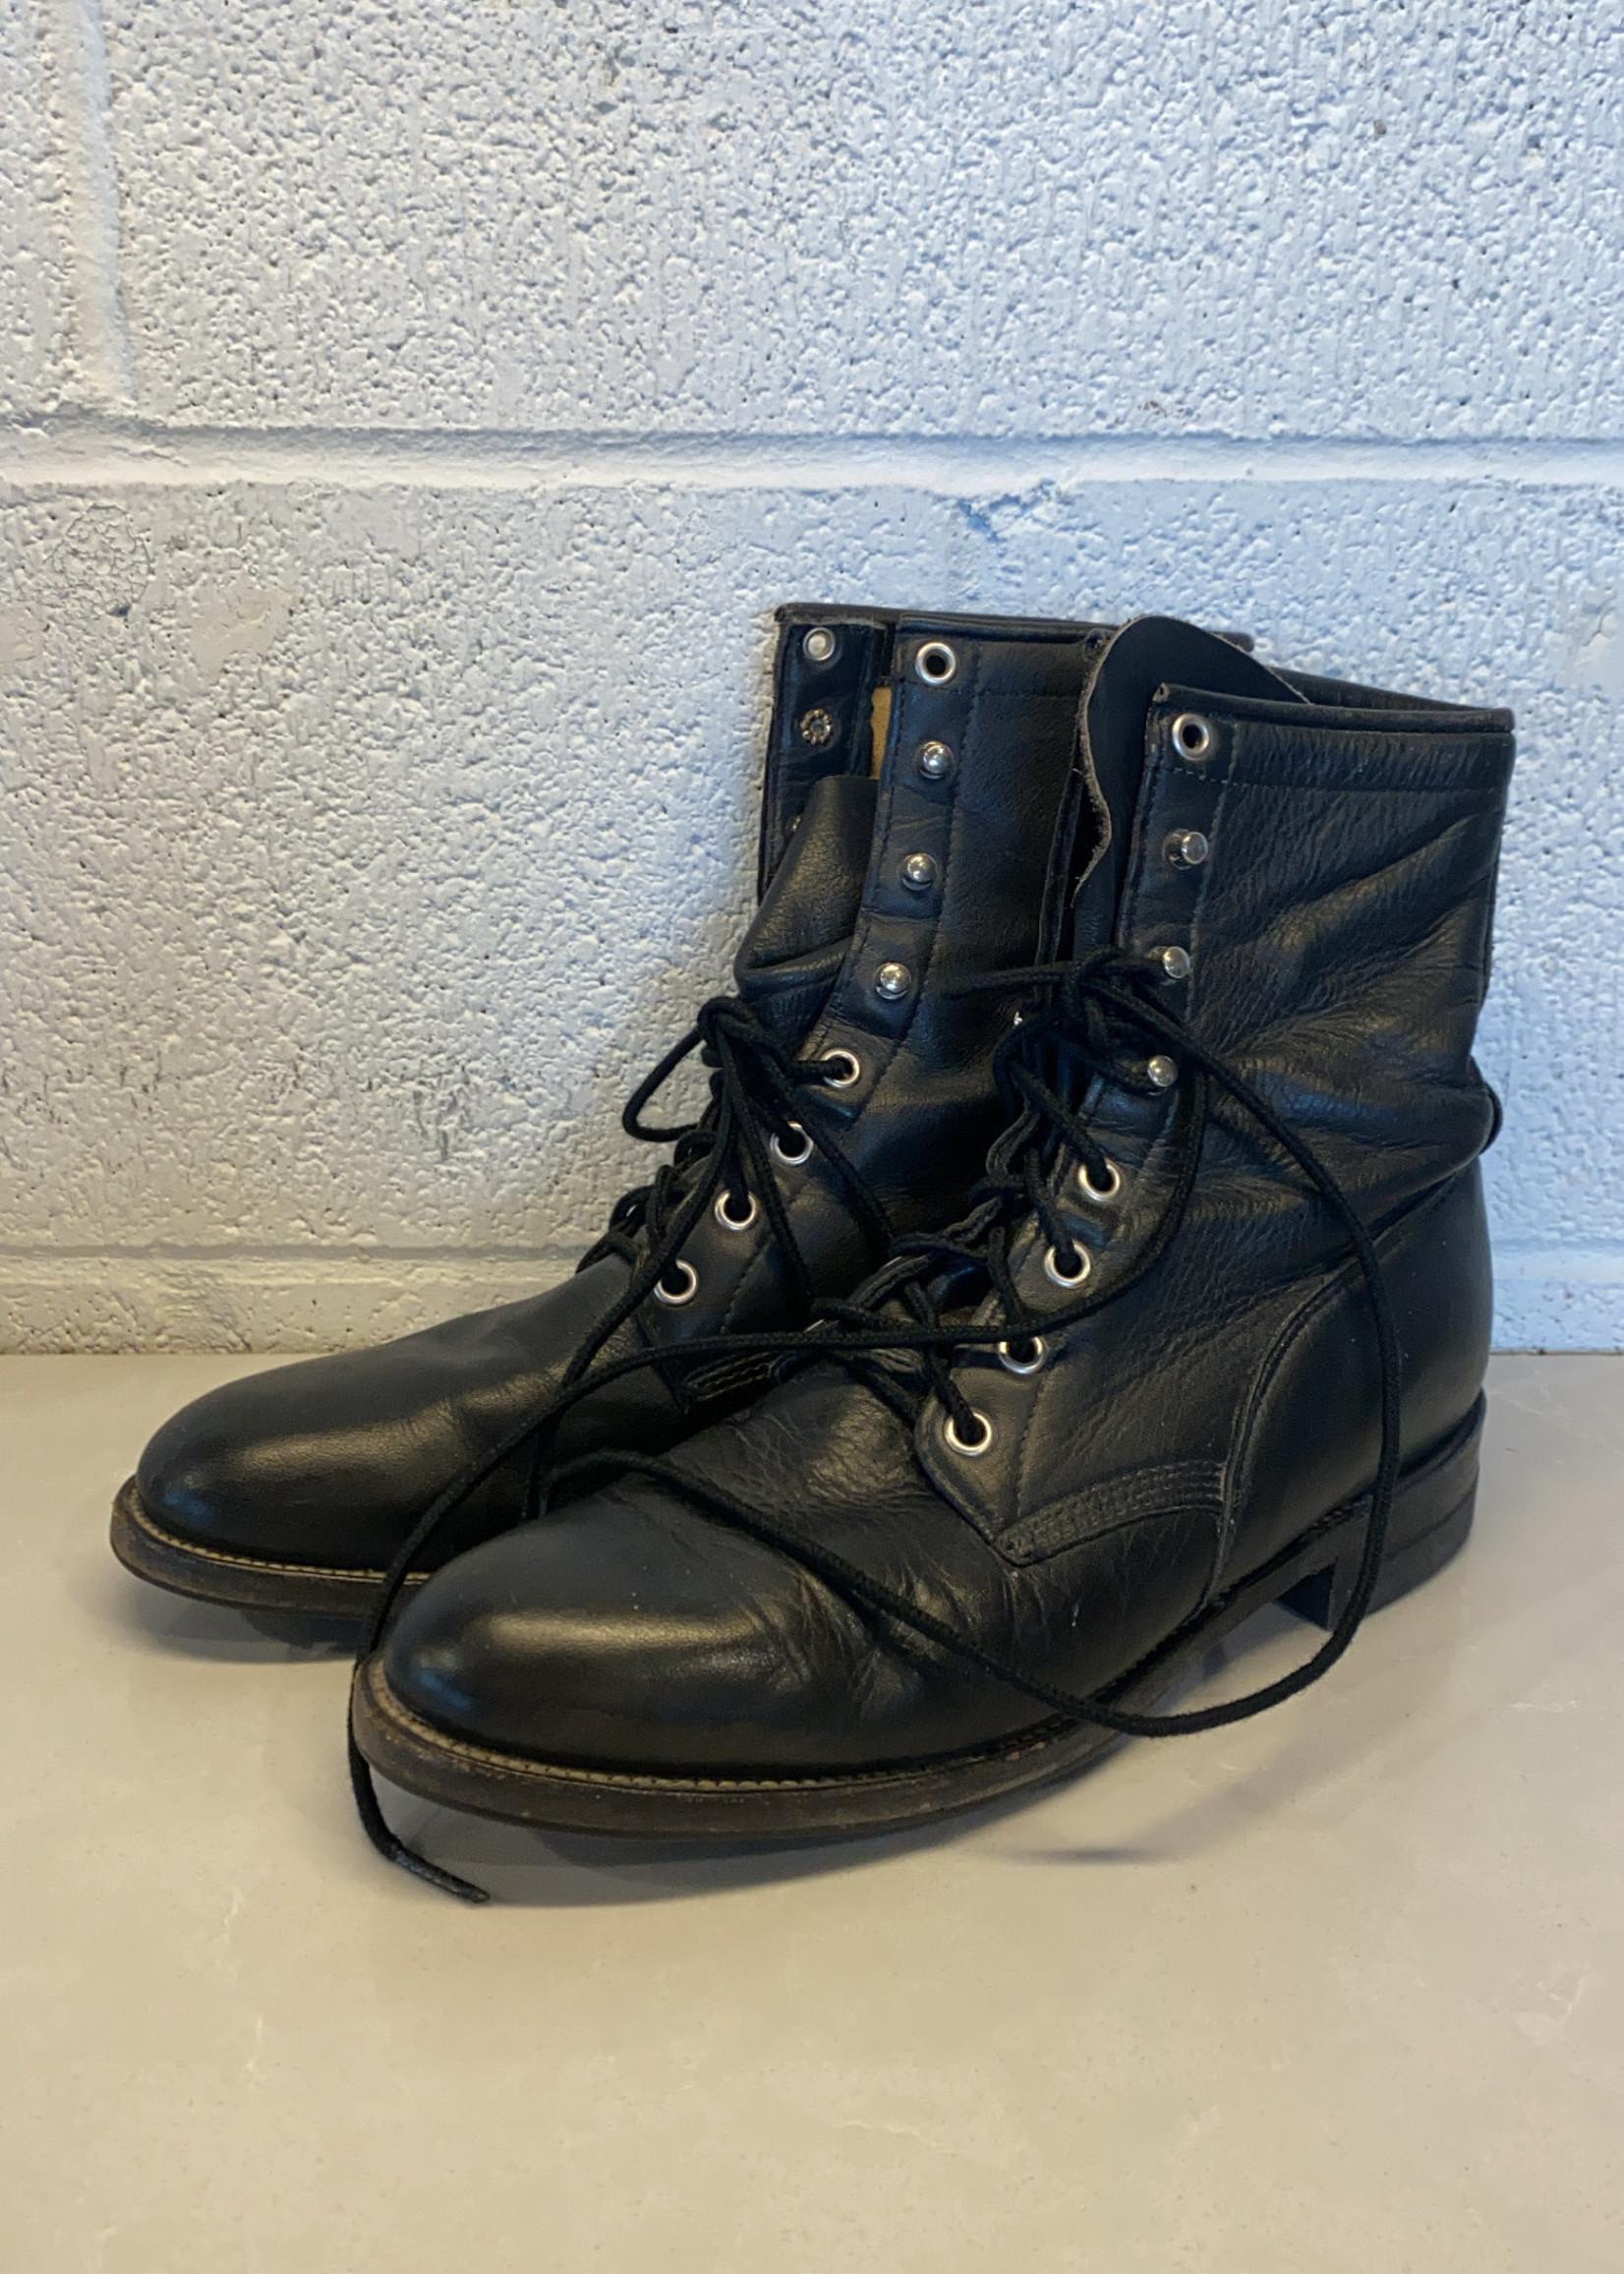 black leather combat boots 7